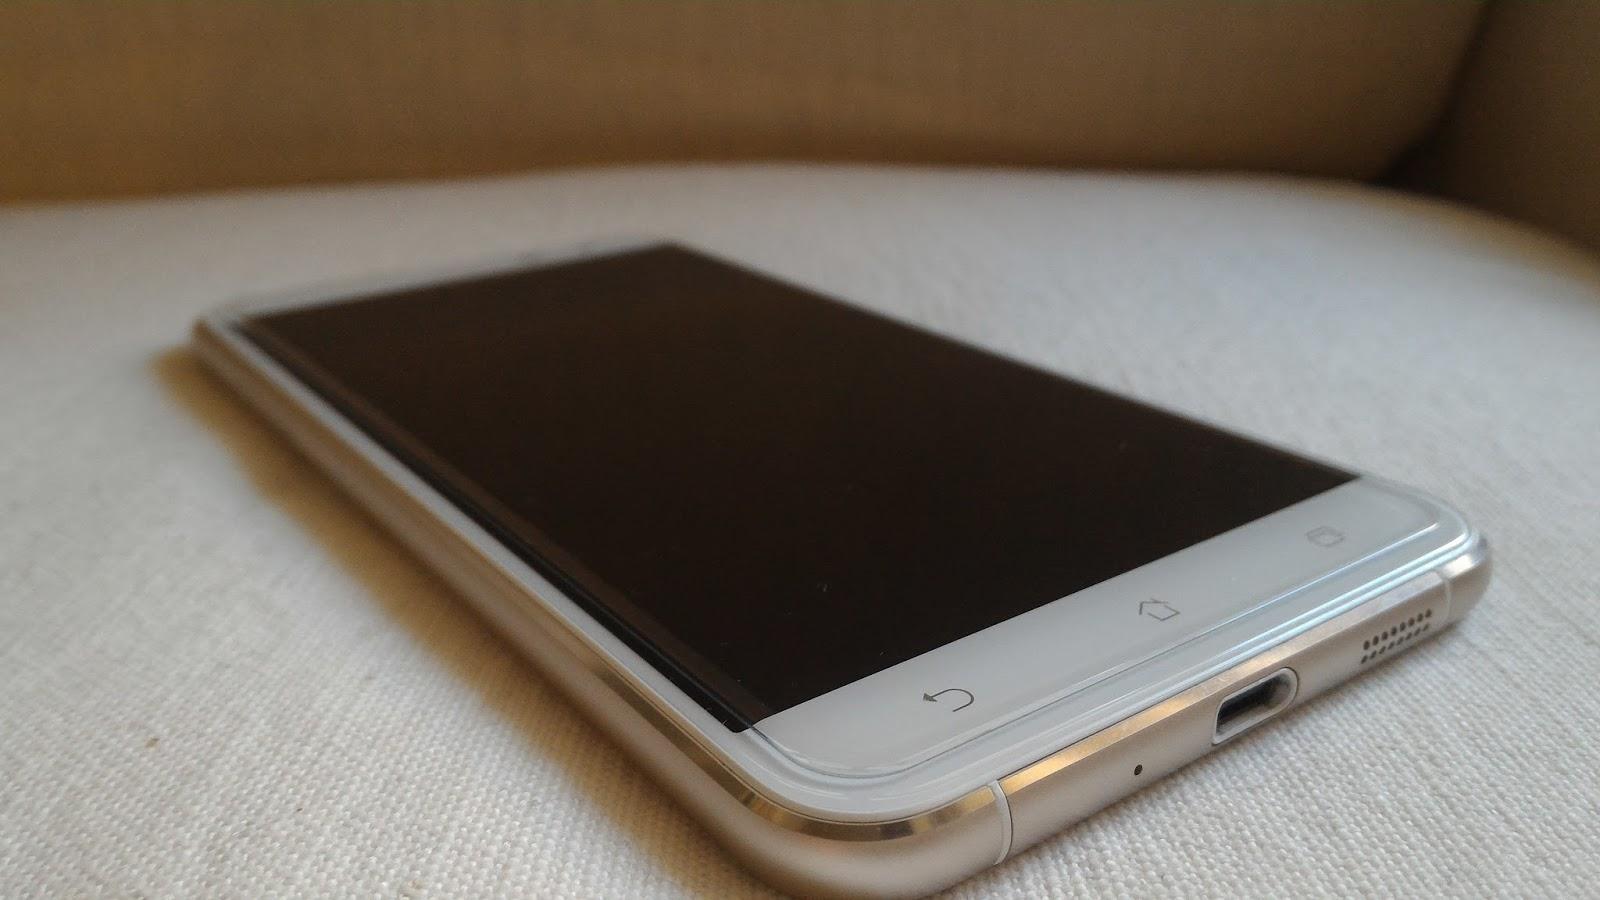 P 20170126 162321 - [開箱] 平價奢華 Zenfone 3 ZE552KL 月光白 4G/64G,外型大進化、CP值破表!